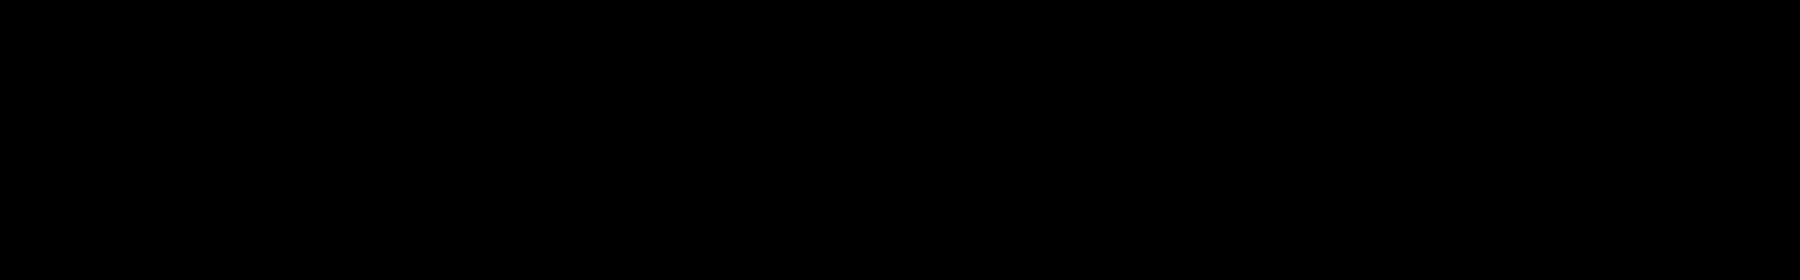 Sylenth Mainroom Patchez audio waveform